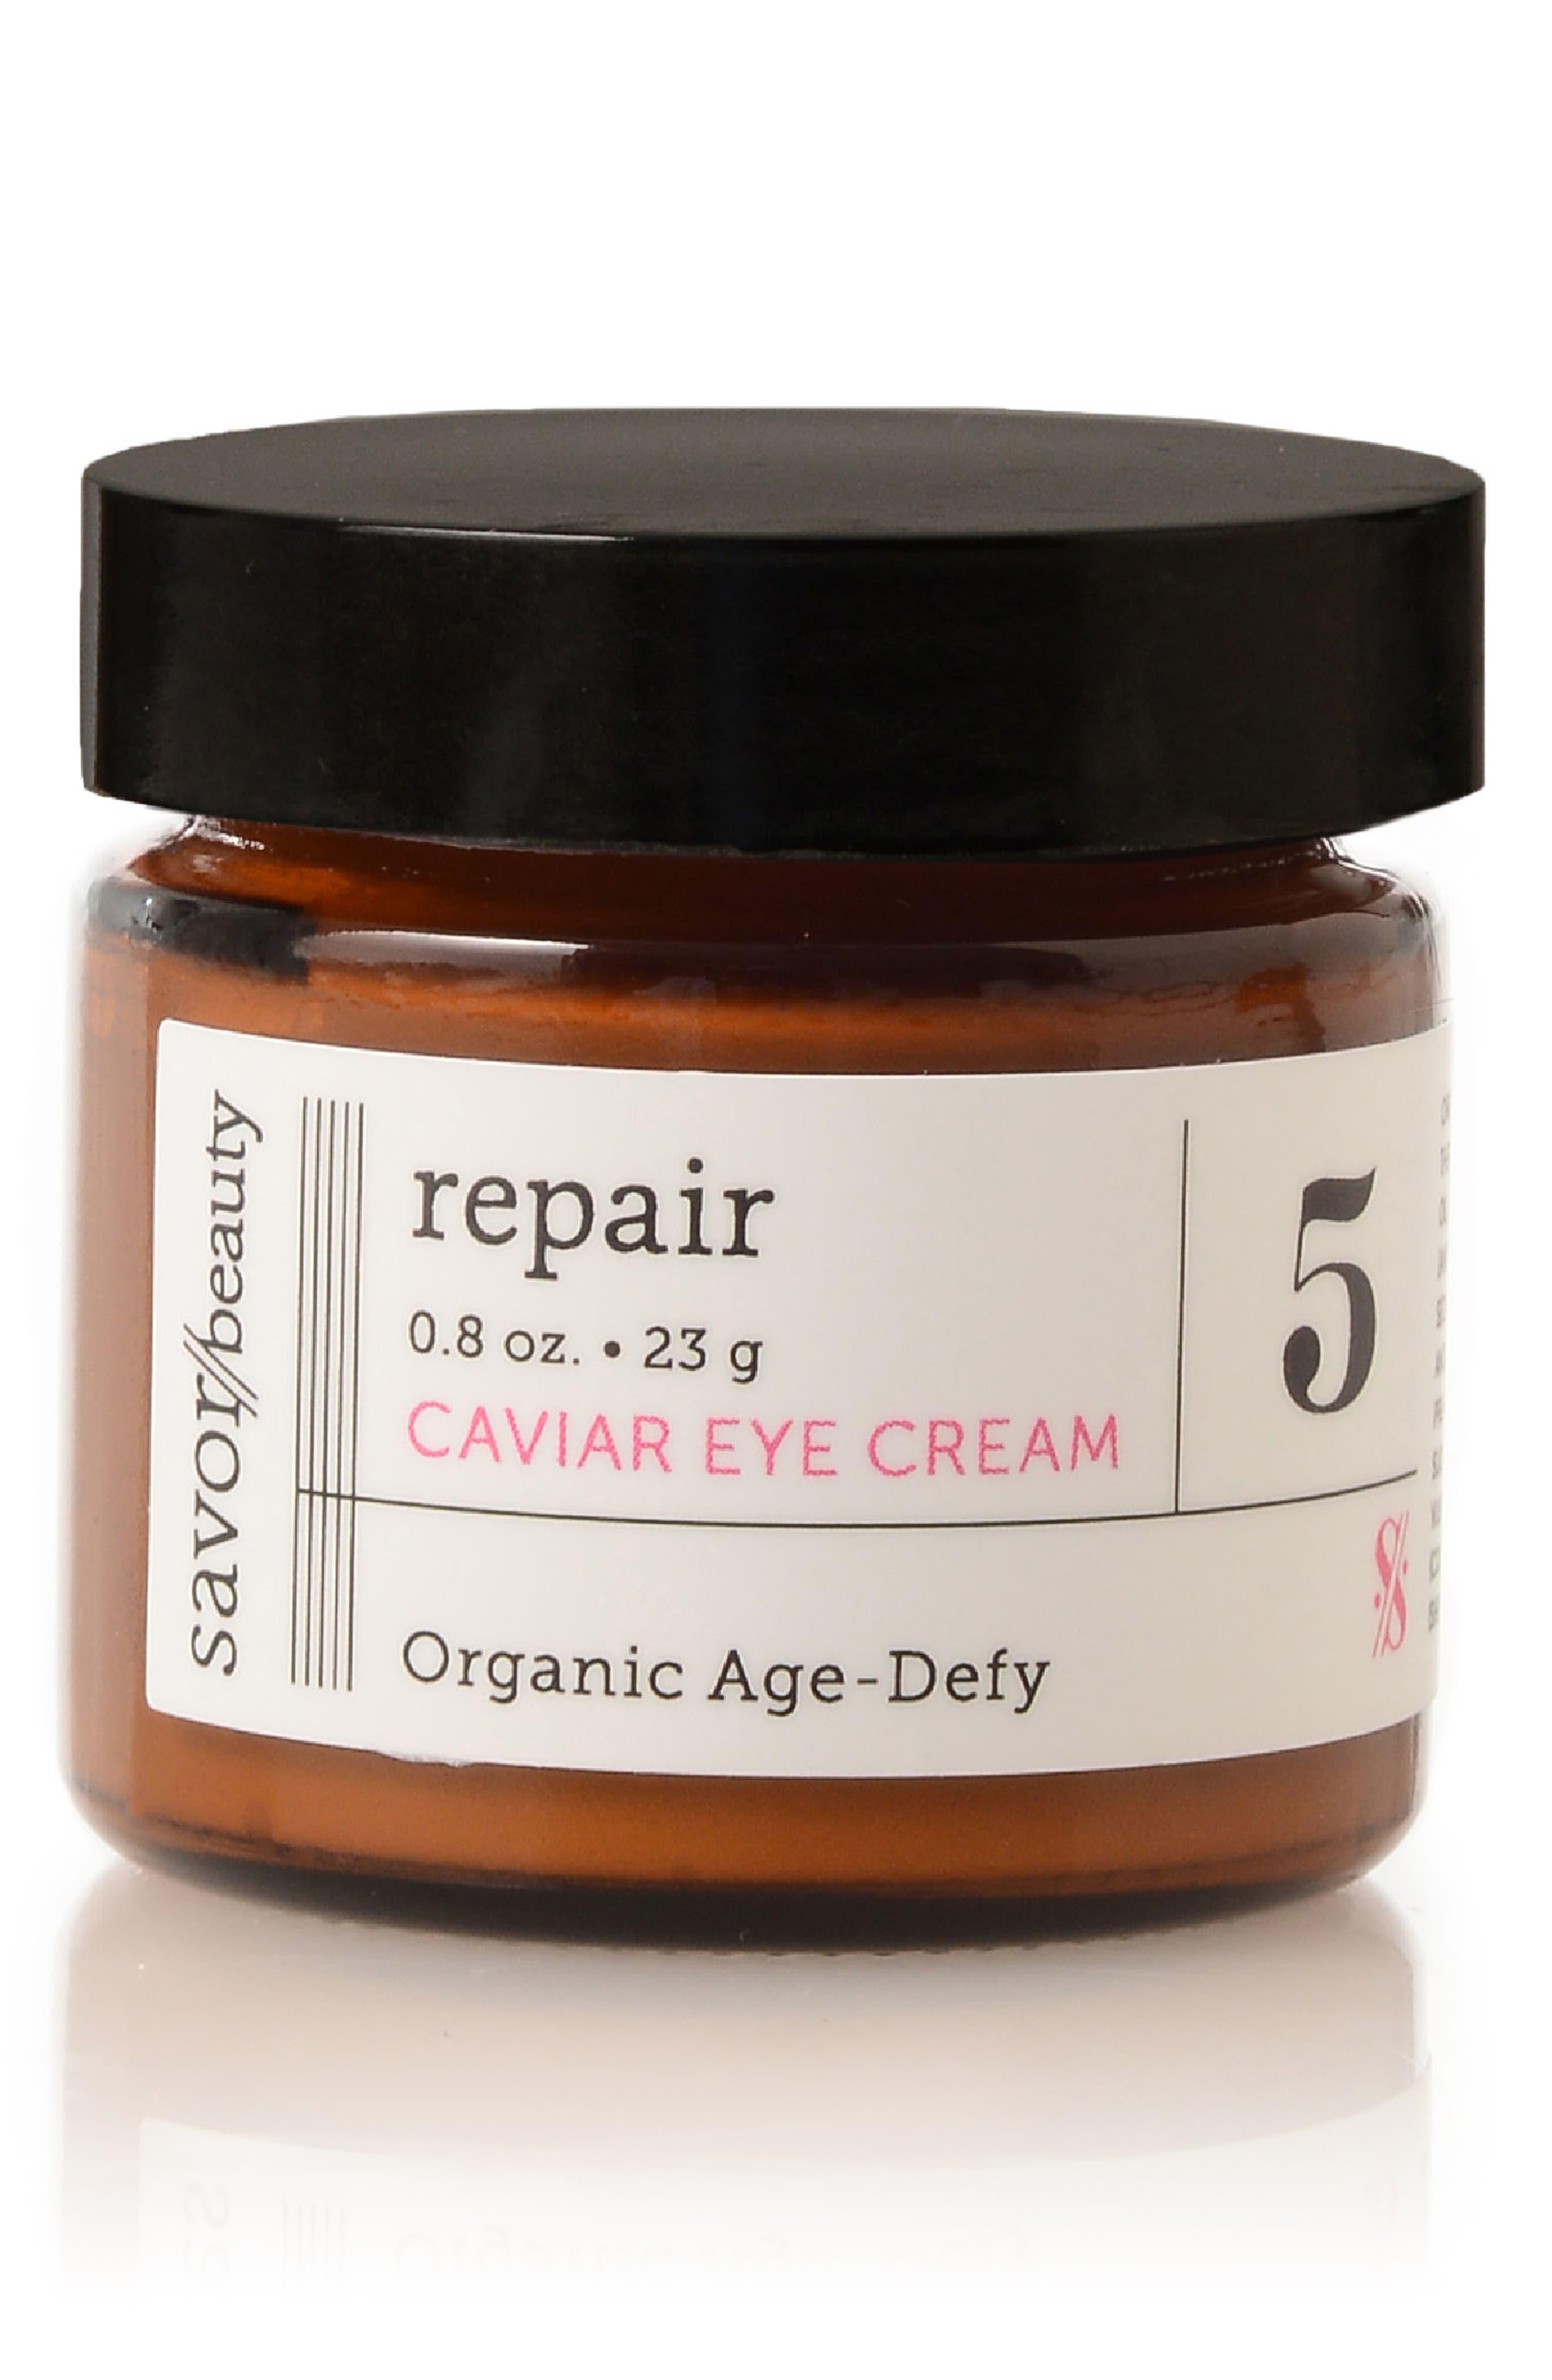 Repair Caviar Eye Cream,                             Main thumbnail 1, color,                             No Color